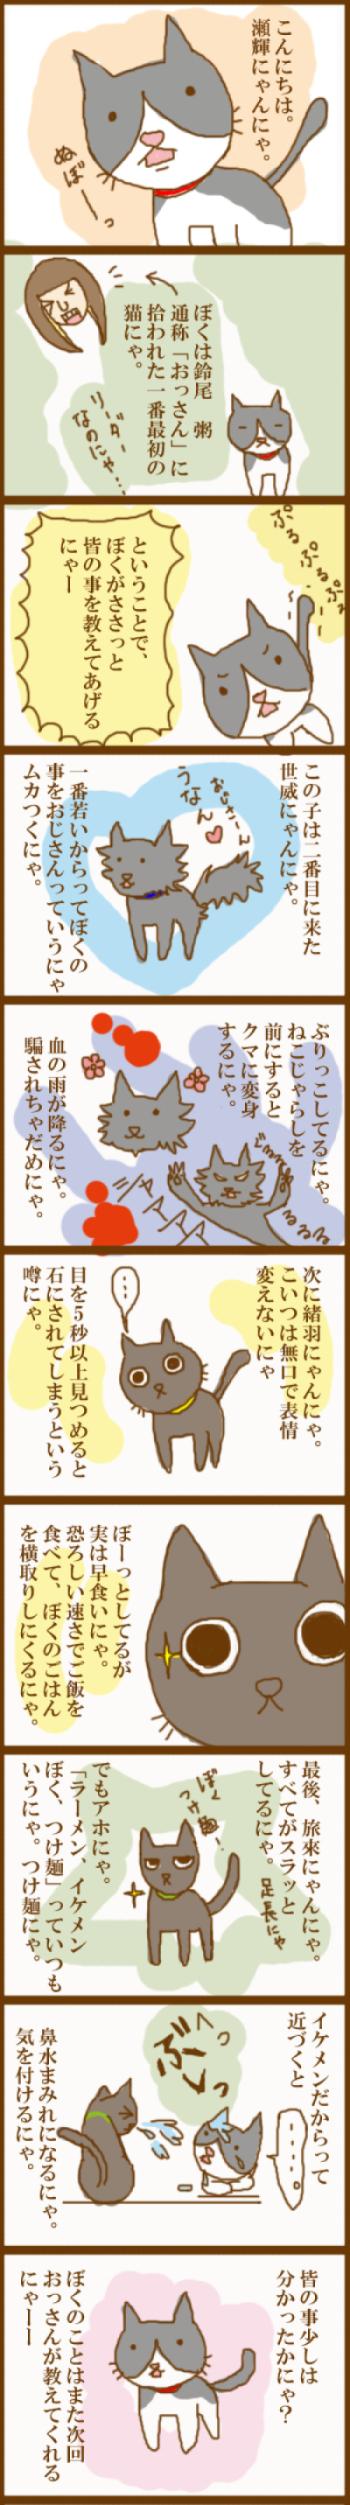 f:id:suzuokayu:20201011194345j:plain